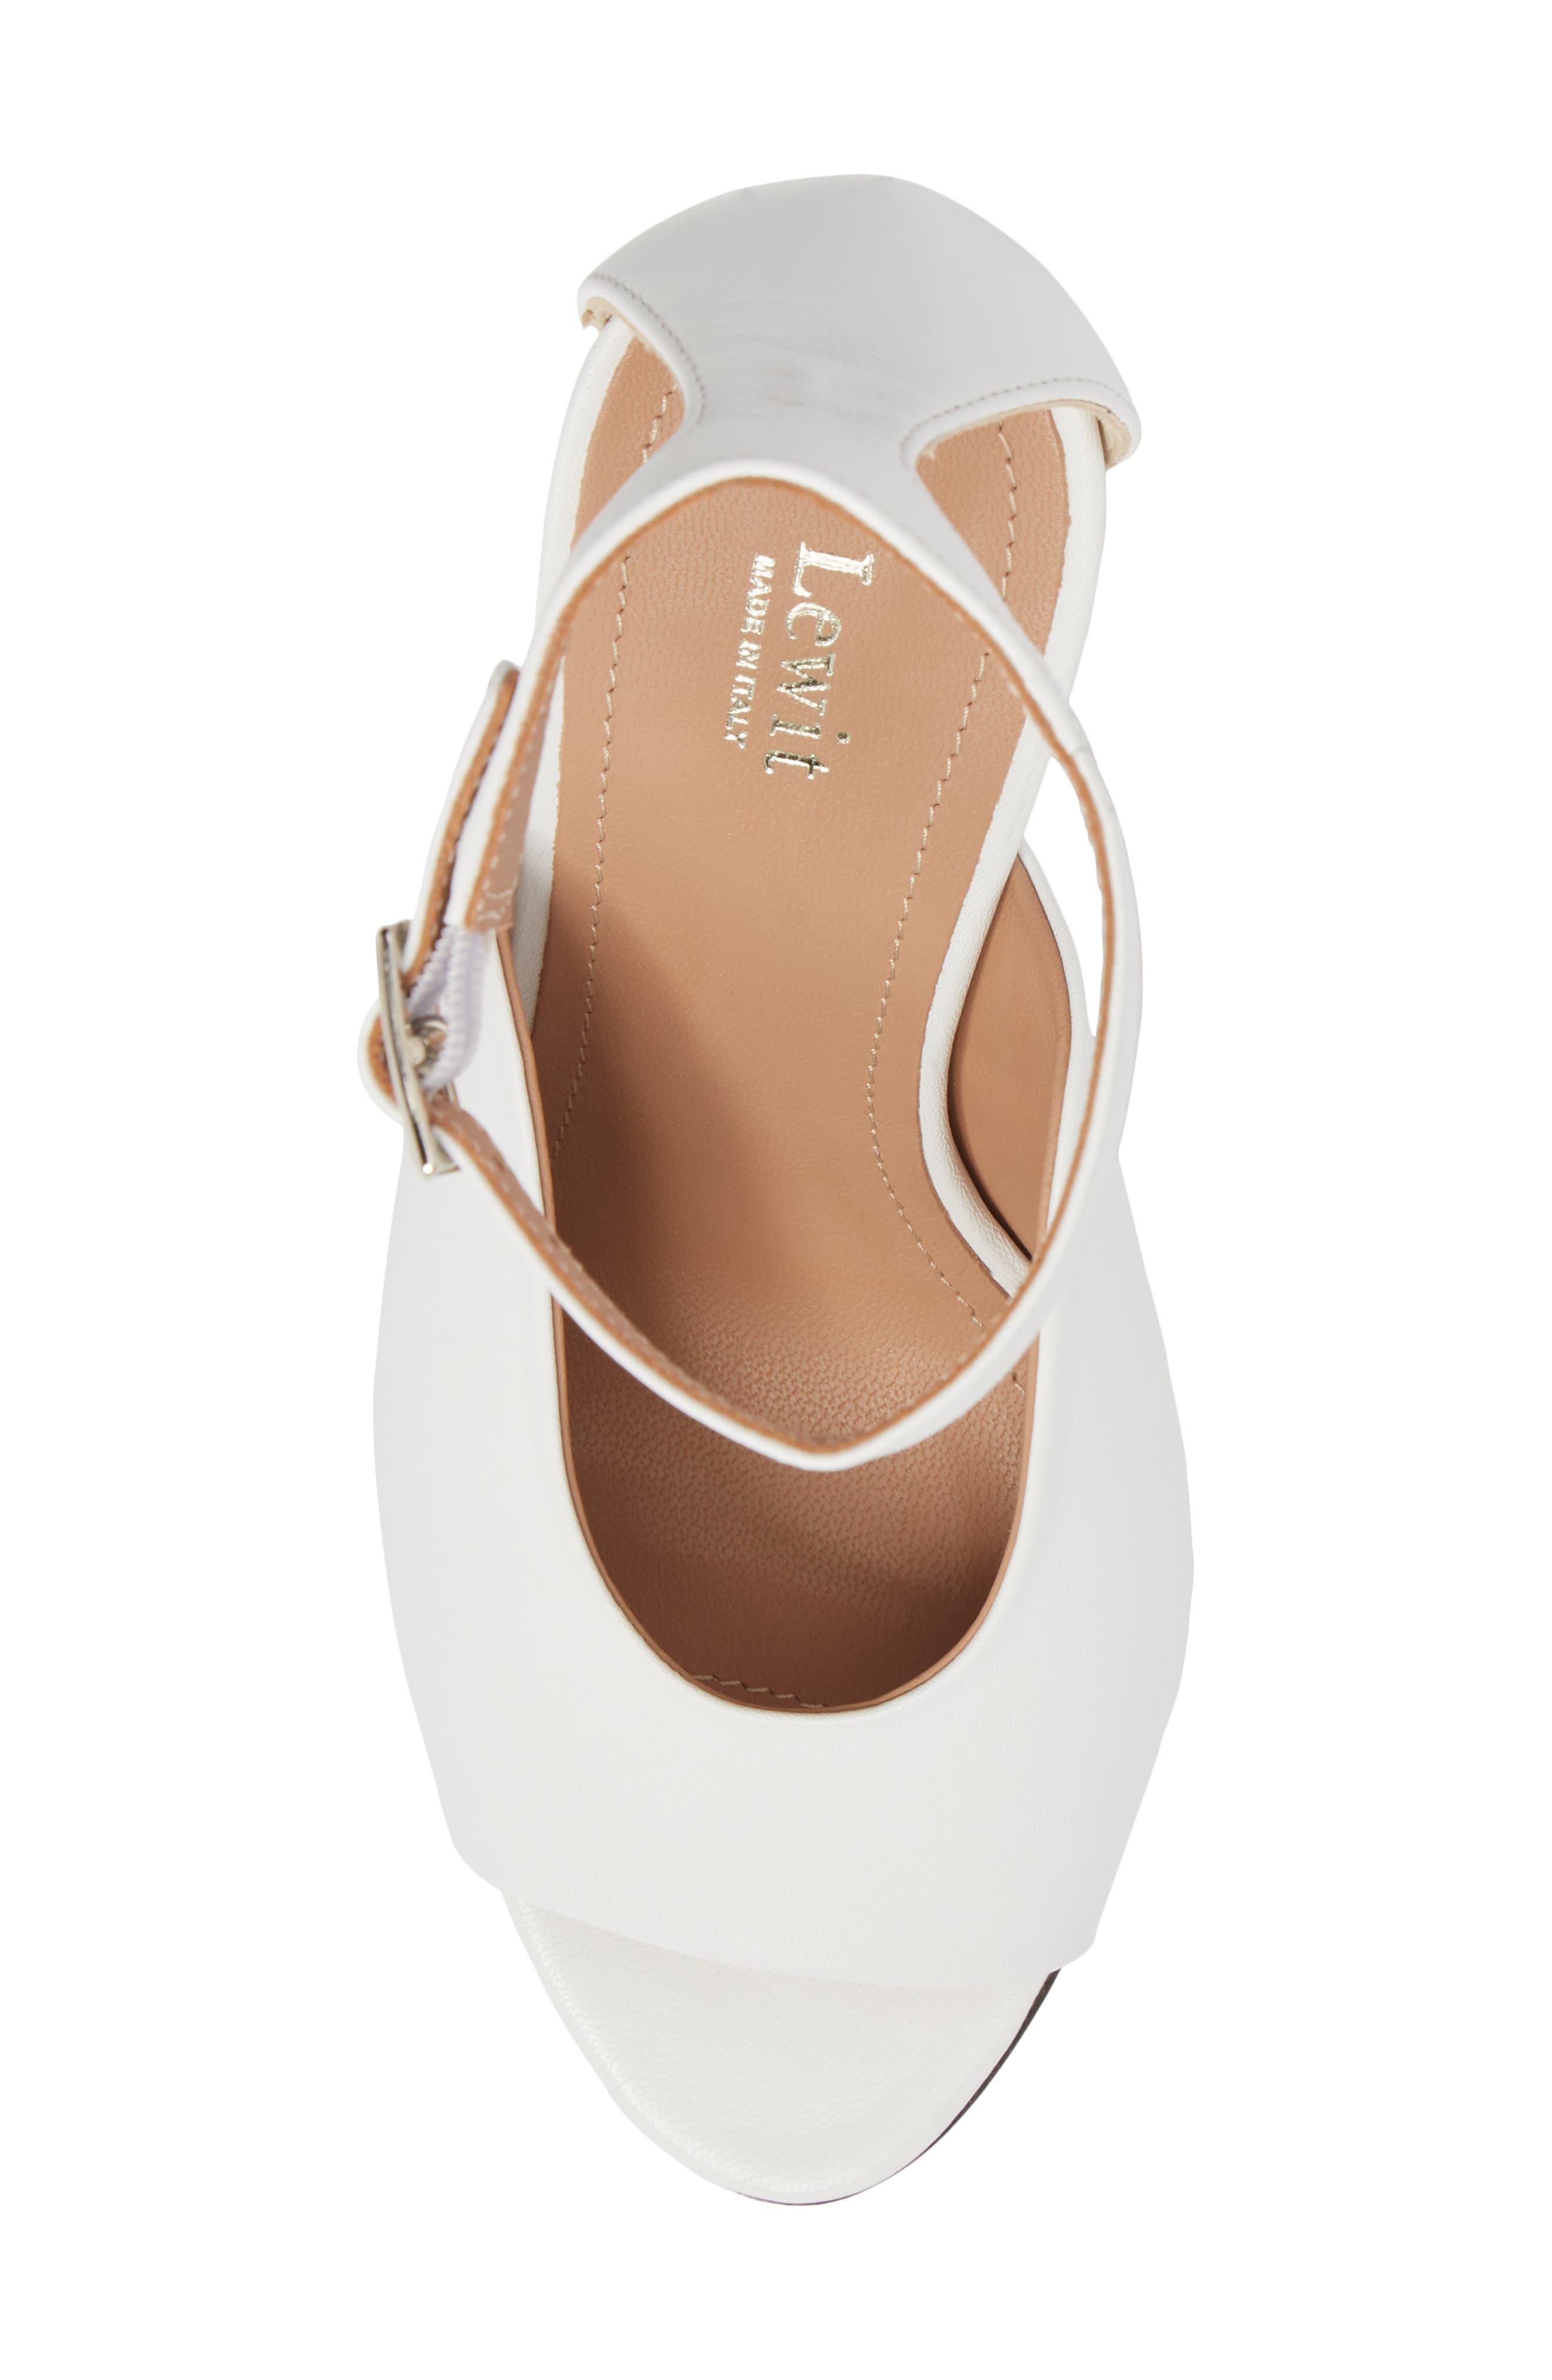 Rosalia Halo Strap Sandal,                             Alternate thumbnail 5, color,                             White Leather